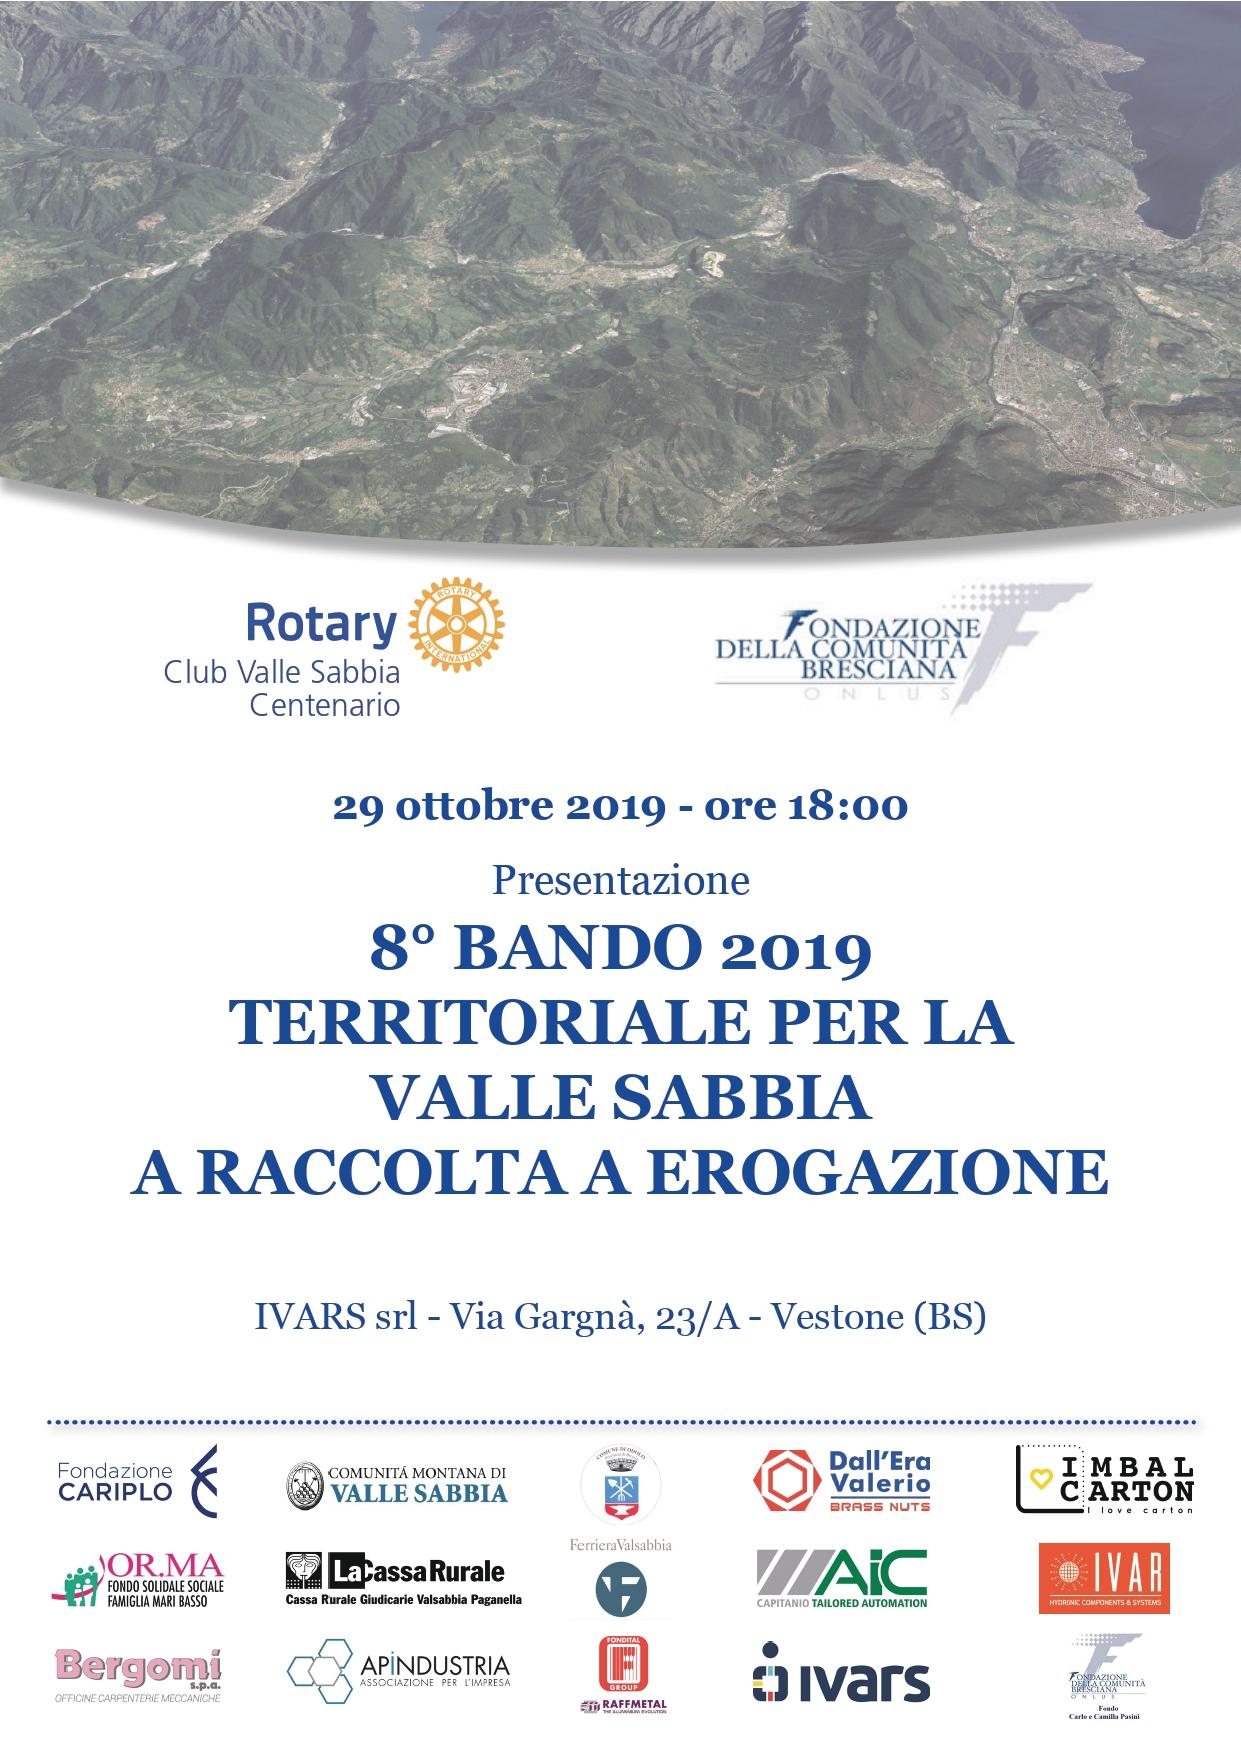 locandina-bando-valle-sabbia_page-00011